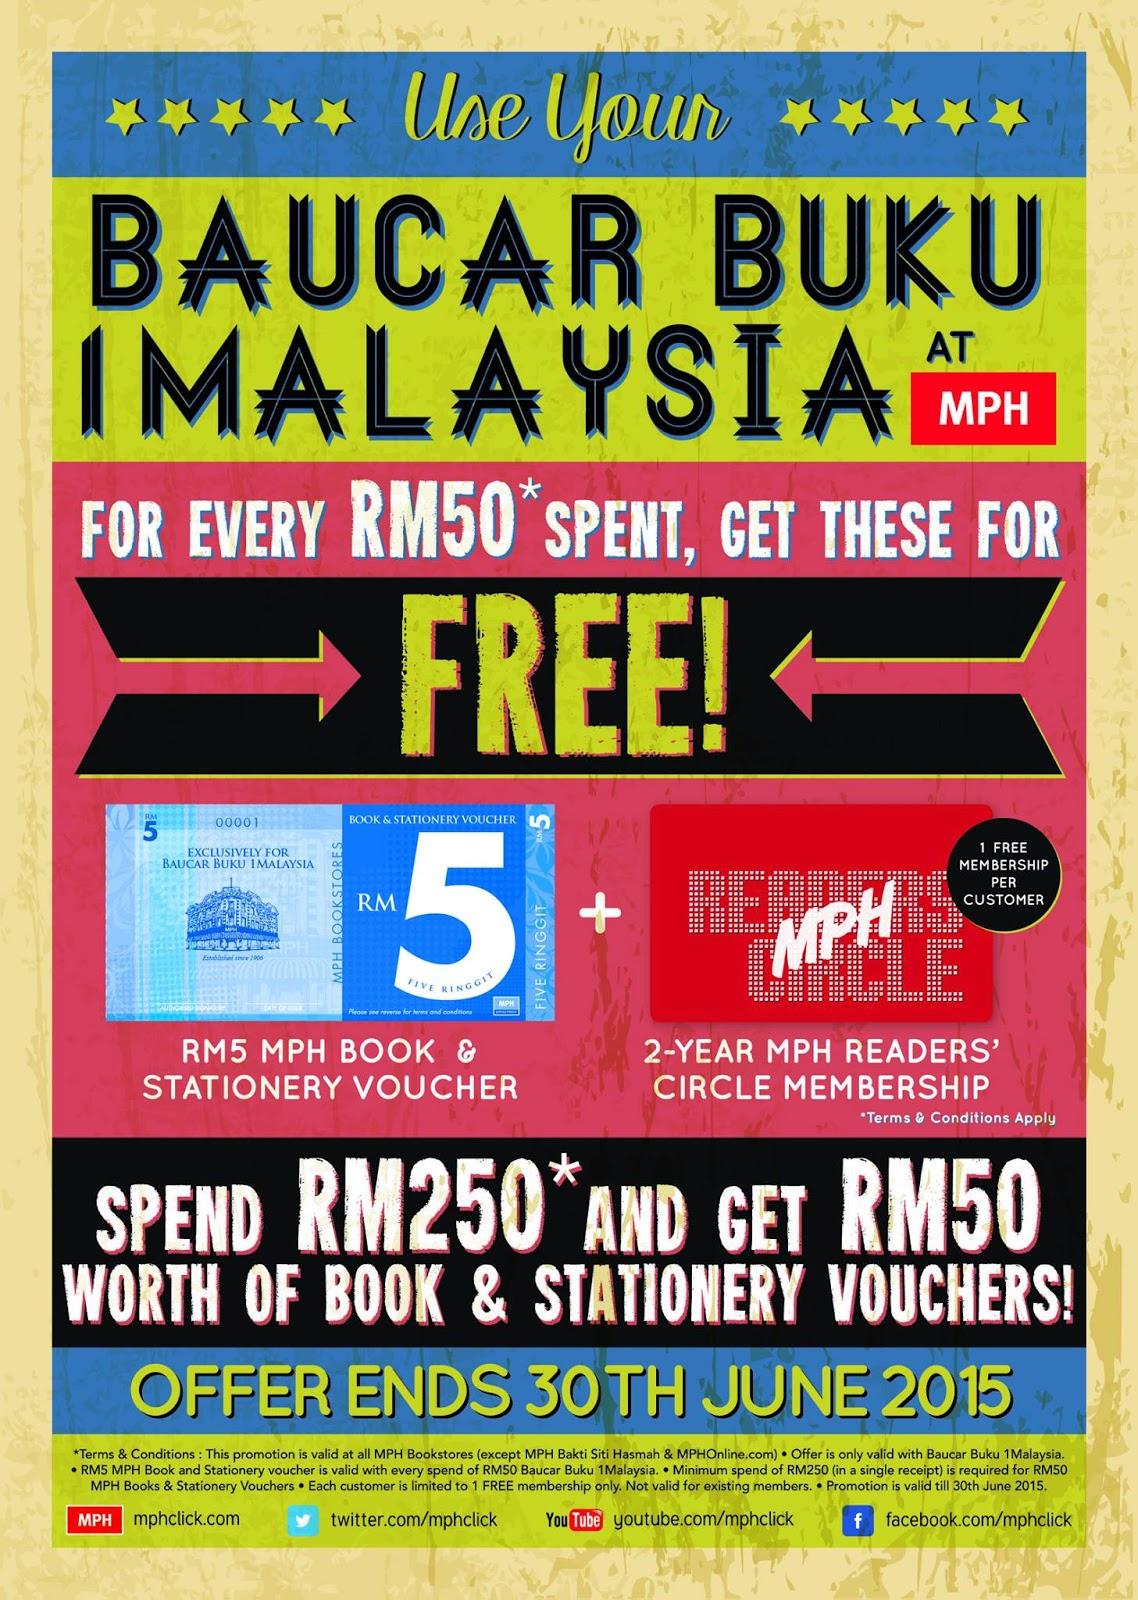 Mph S Bb1m 2015 Promotion Free Book Stationery Voucher Mph